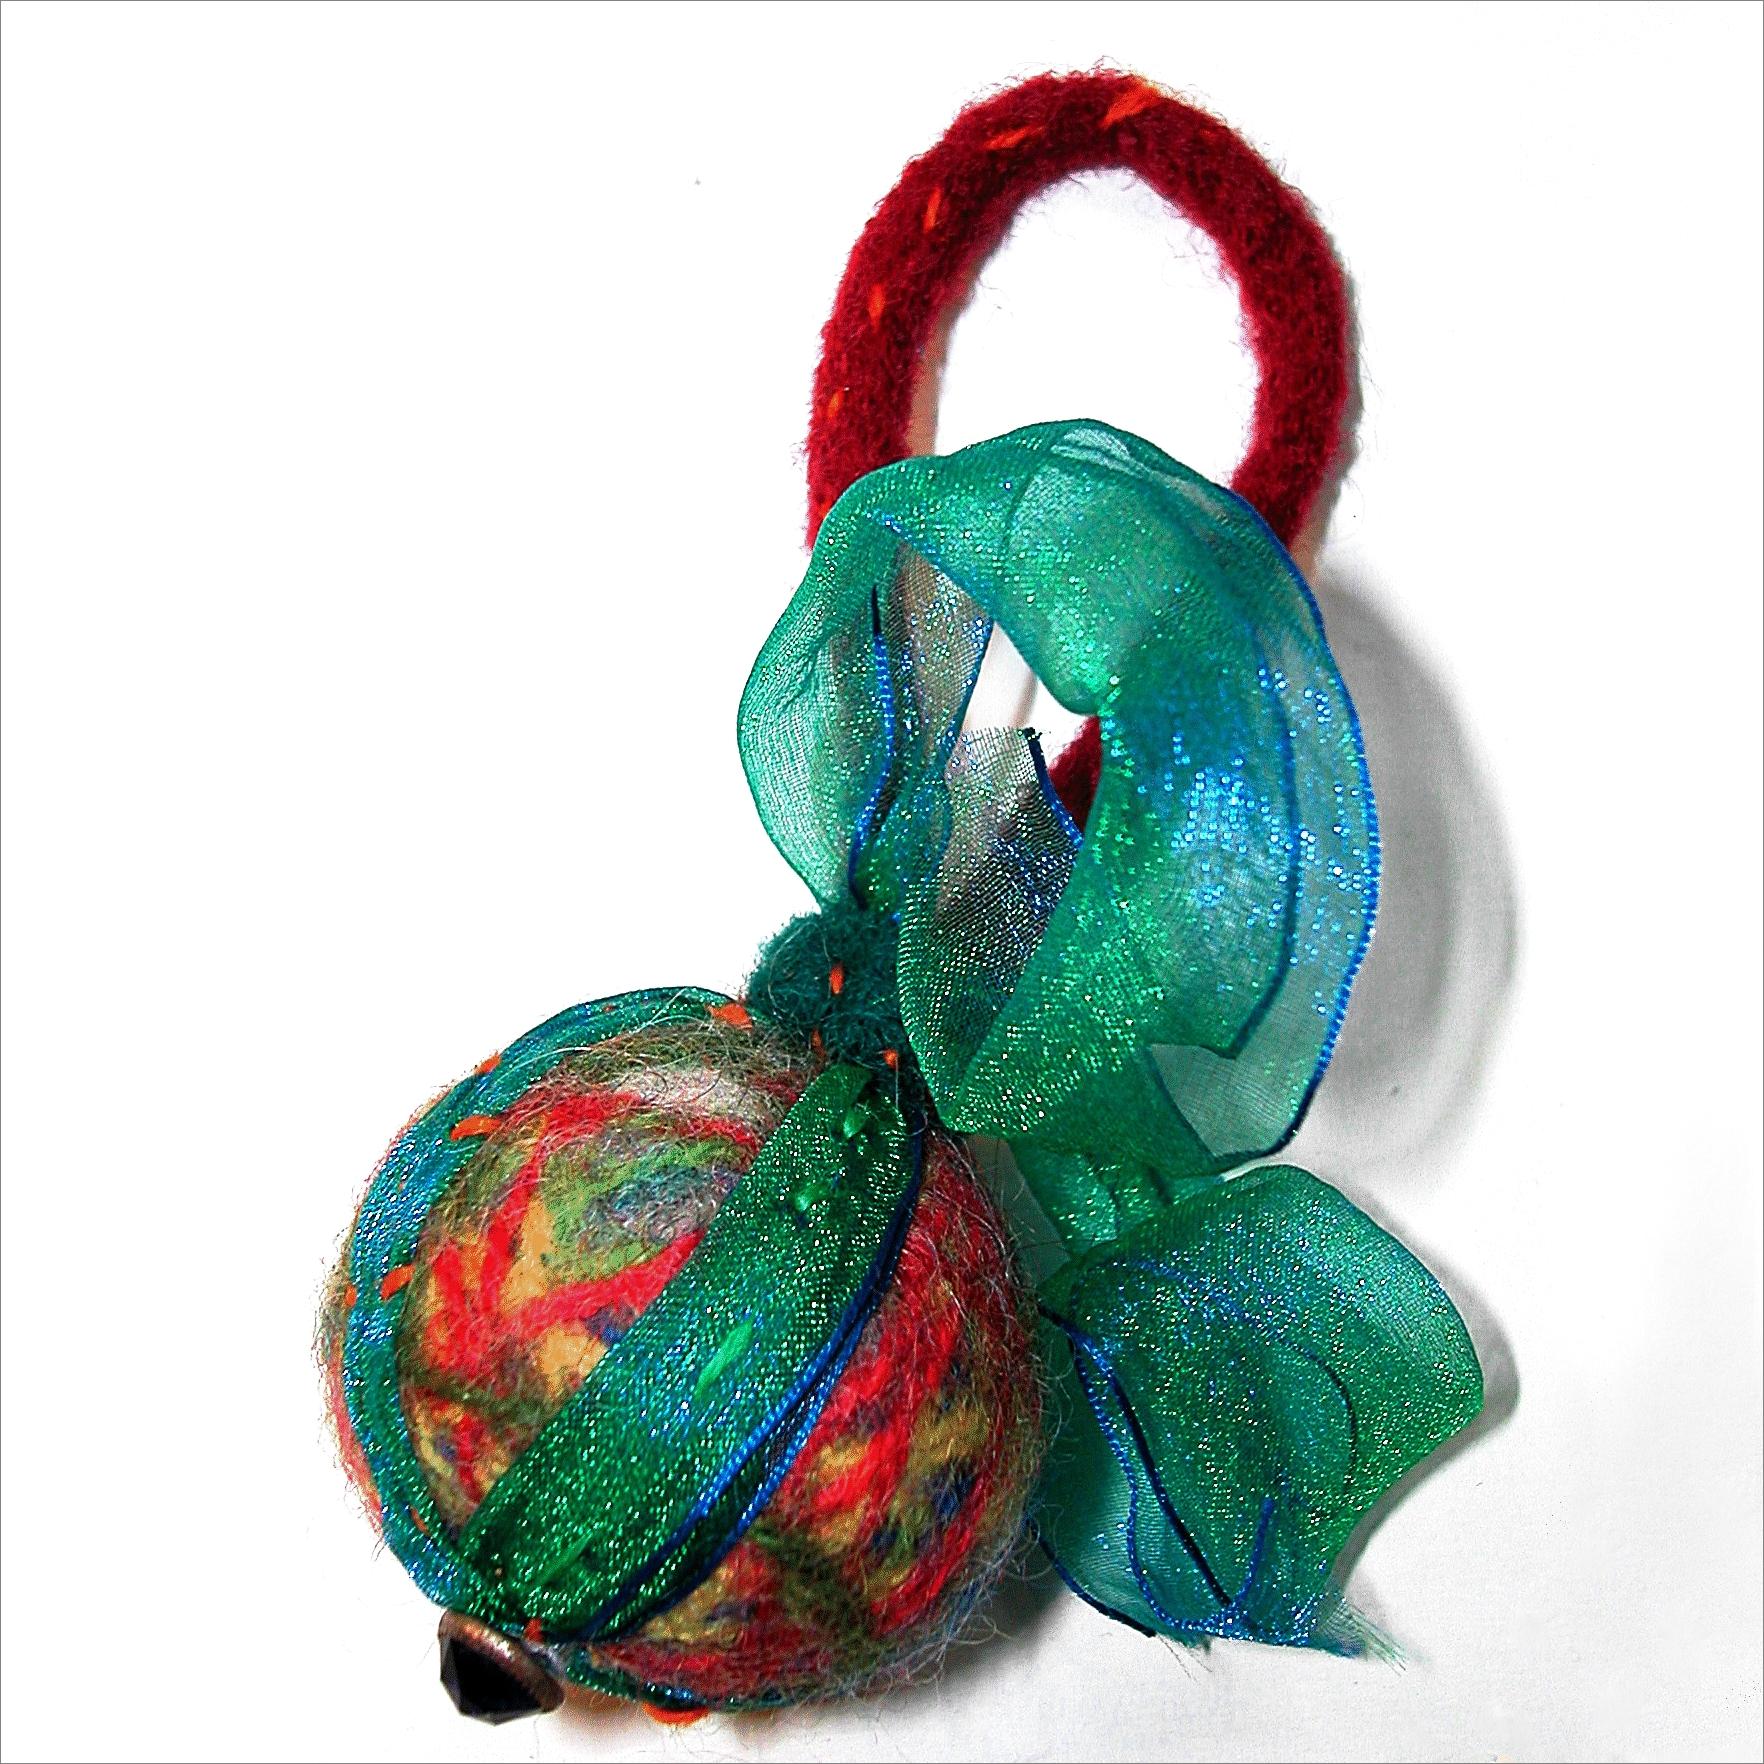 wool ball ornament green red.jpg